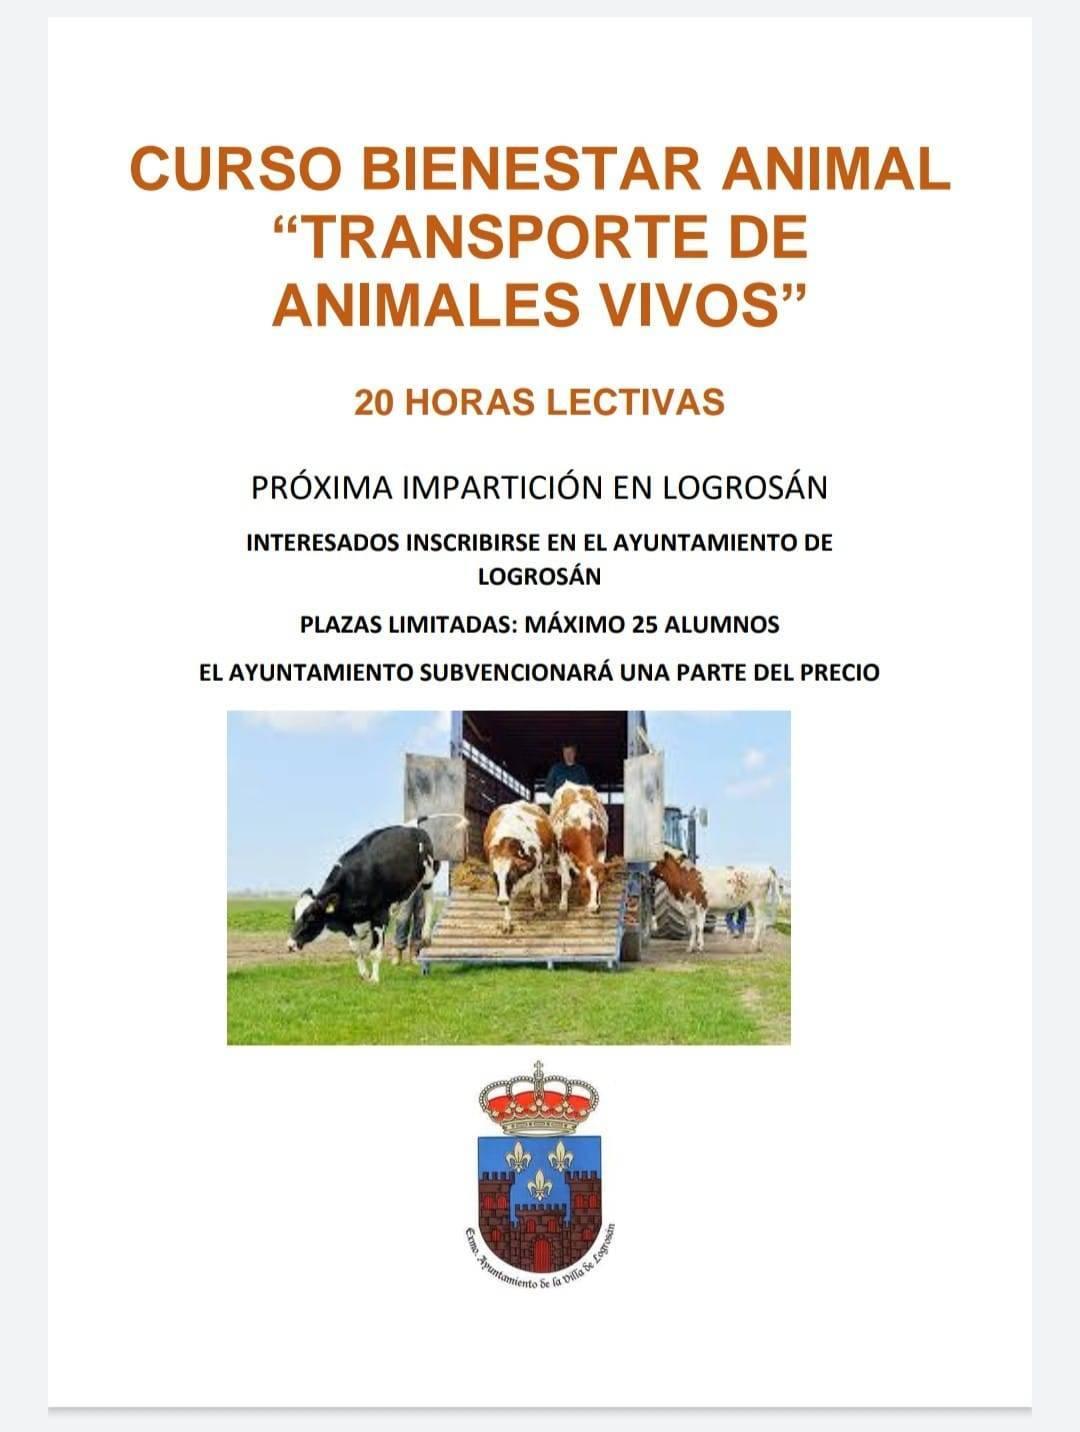 Curso de bienestar animal (2021) - Logrosán (Cáceres)